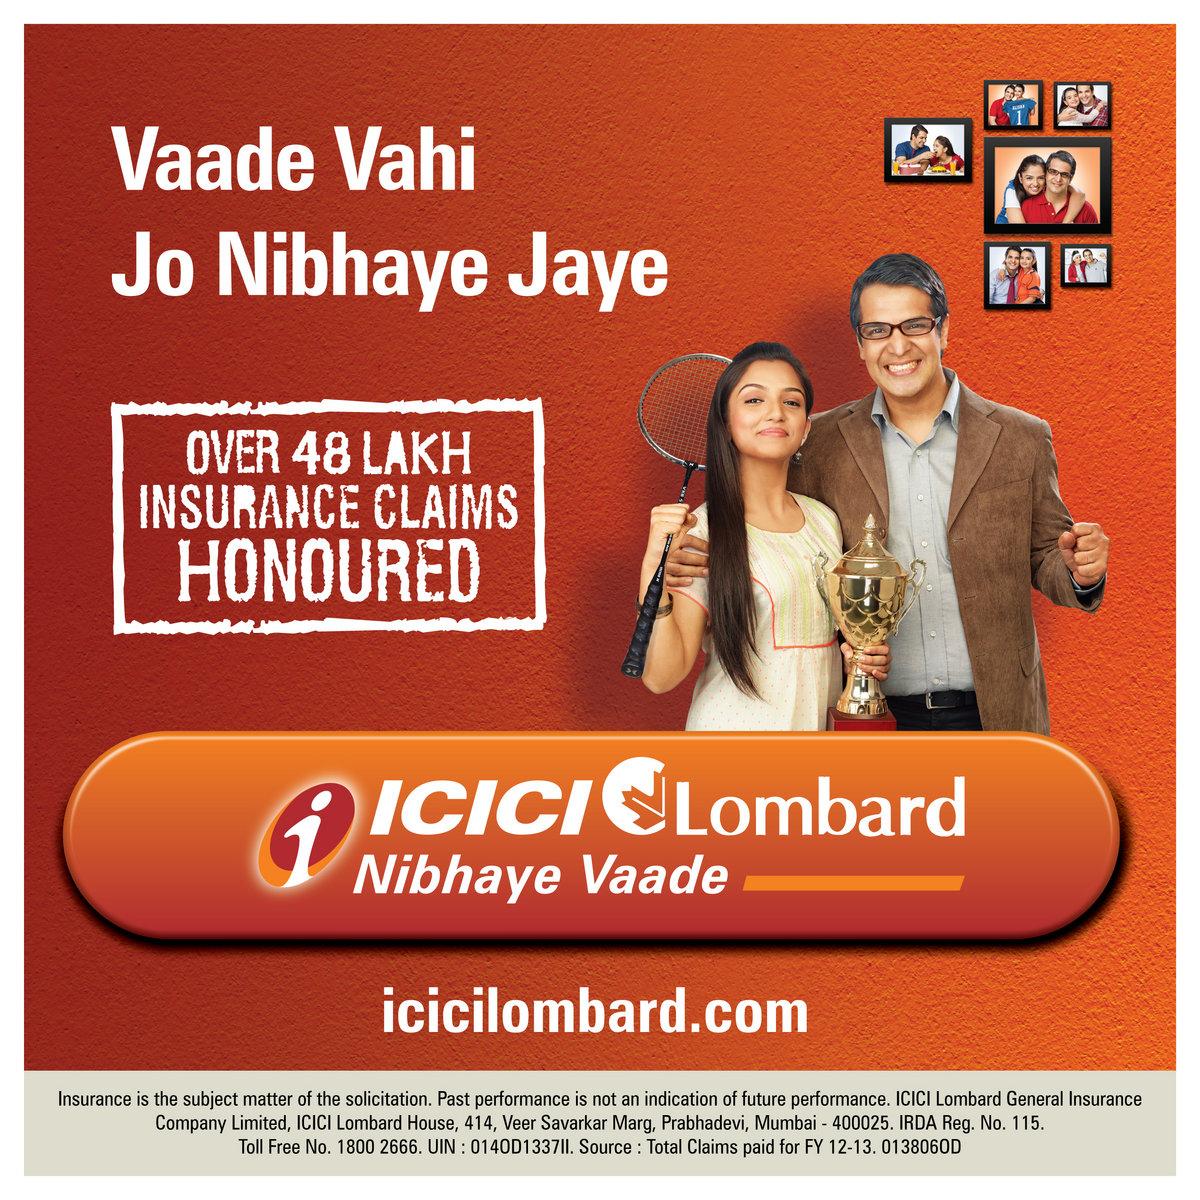 film download free hindi movies 3gp